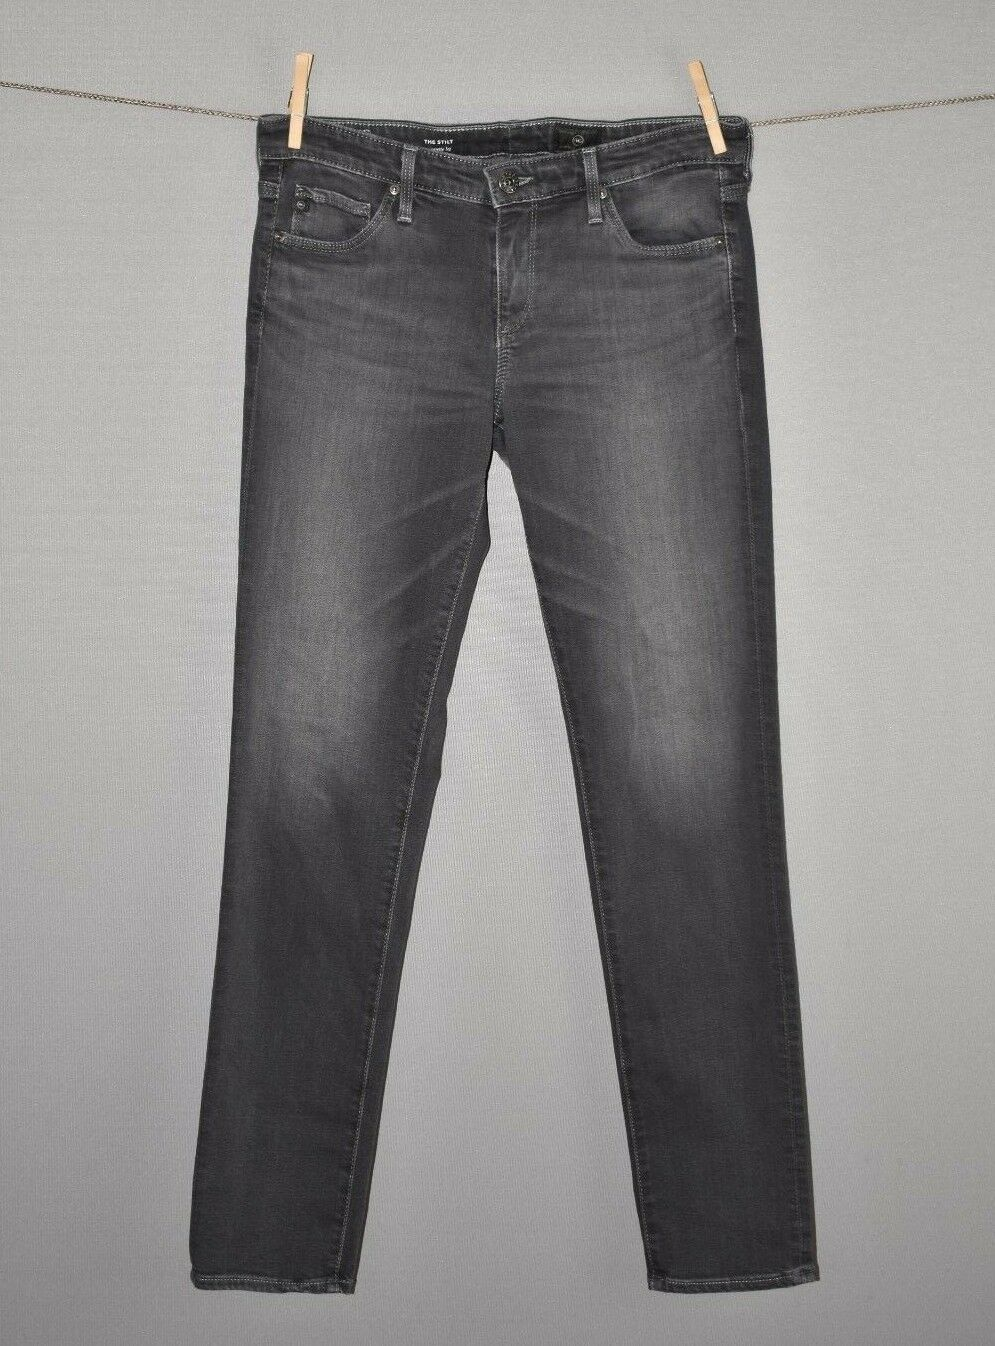 AG ADRIANO goldSCHMIED  Grey Distressed Stilt Cigarette Leg Jeans Size 27